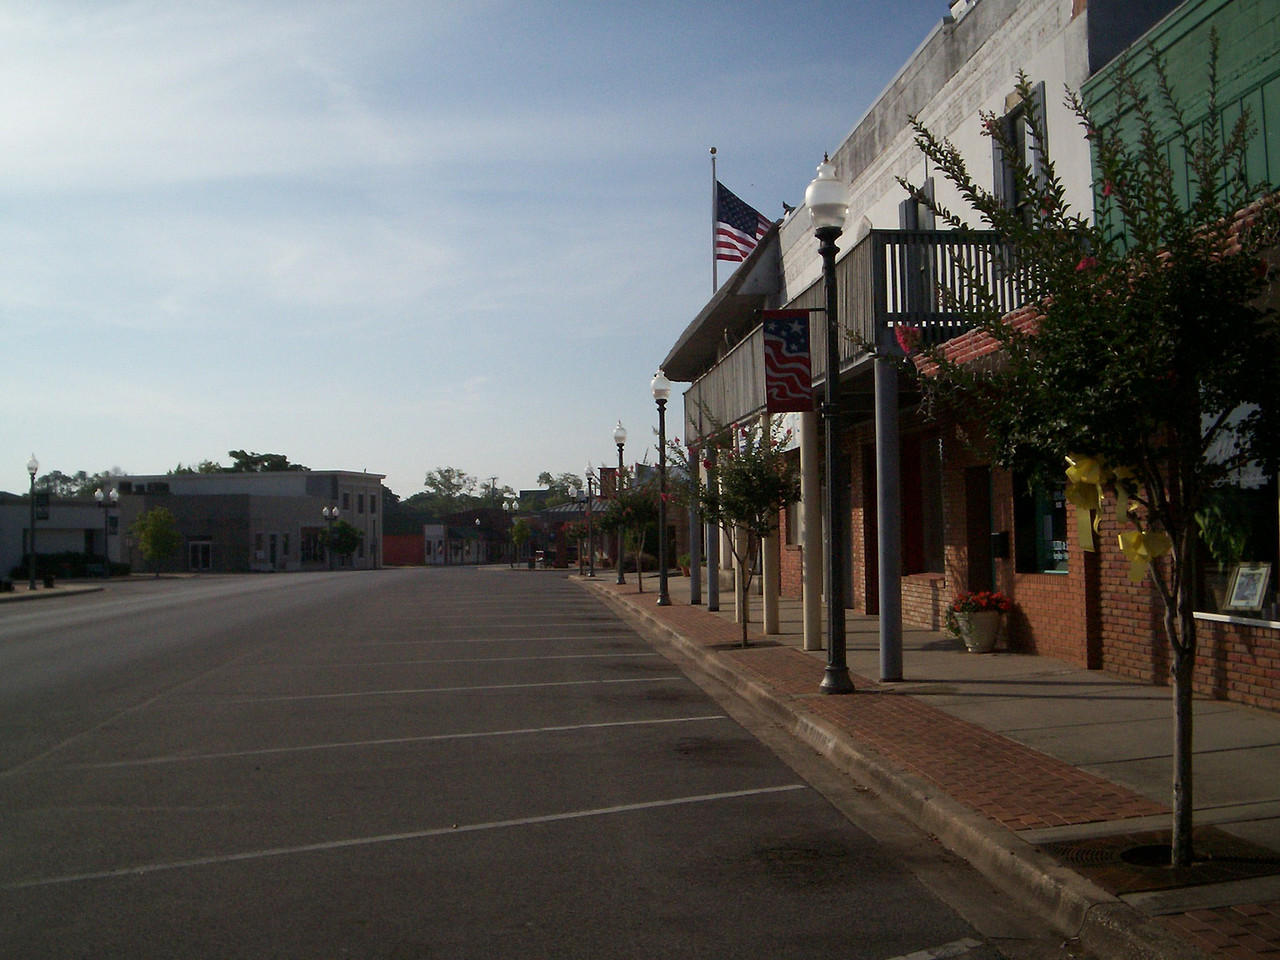 Looking south on Main Street<br /> PHOTO CREDIT: Wallis Mayo / Florida Trail Association